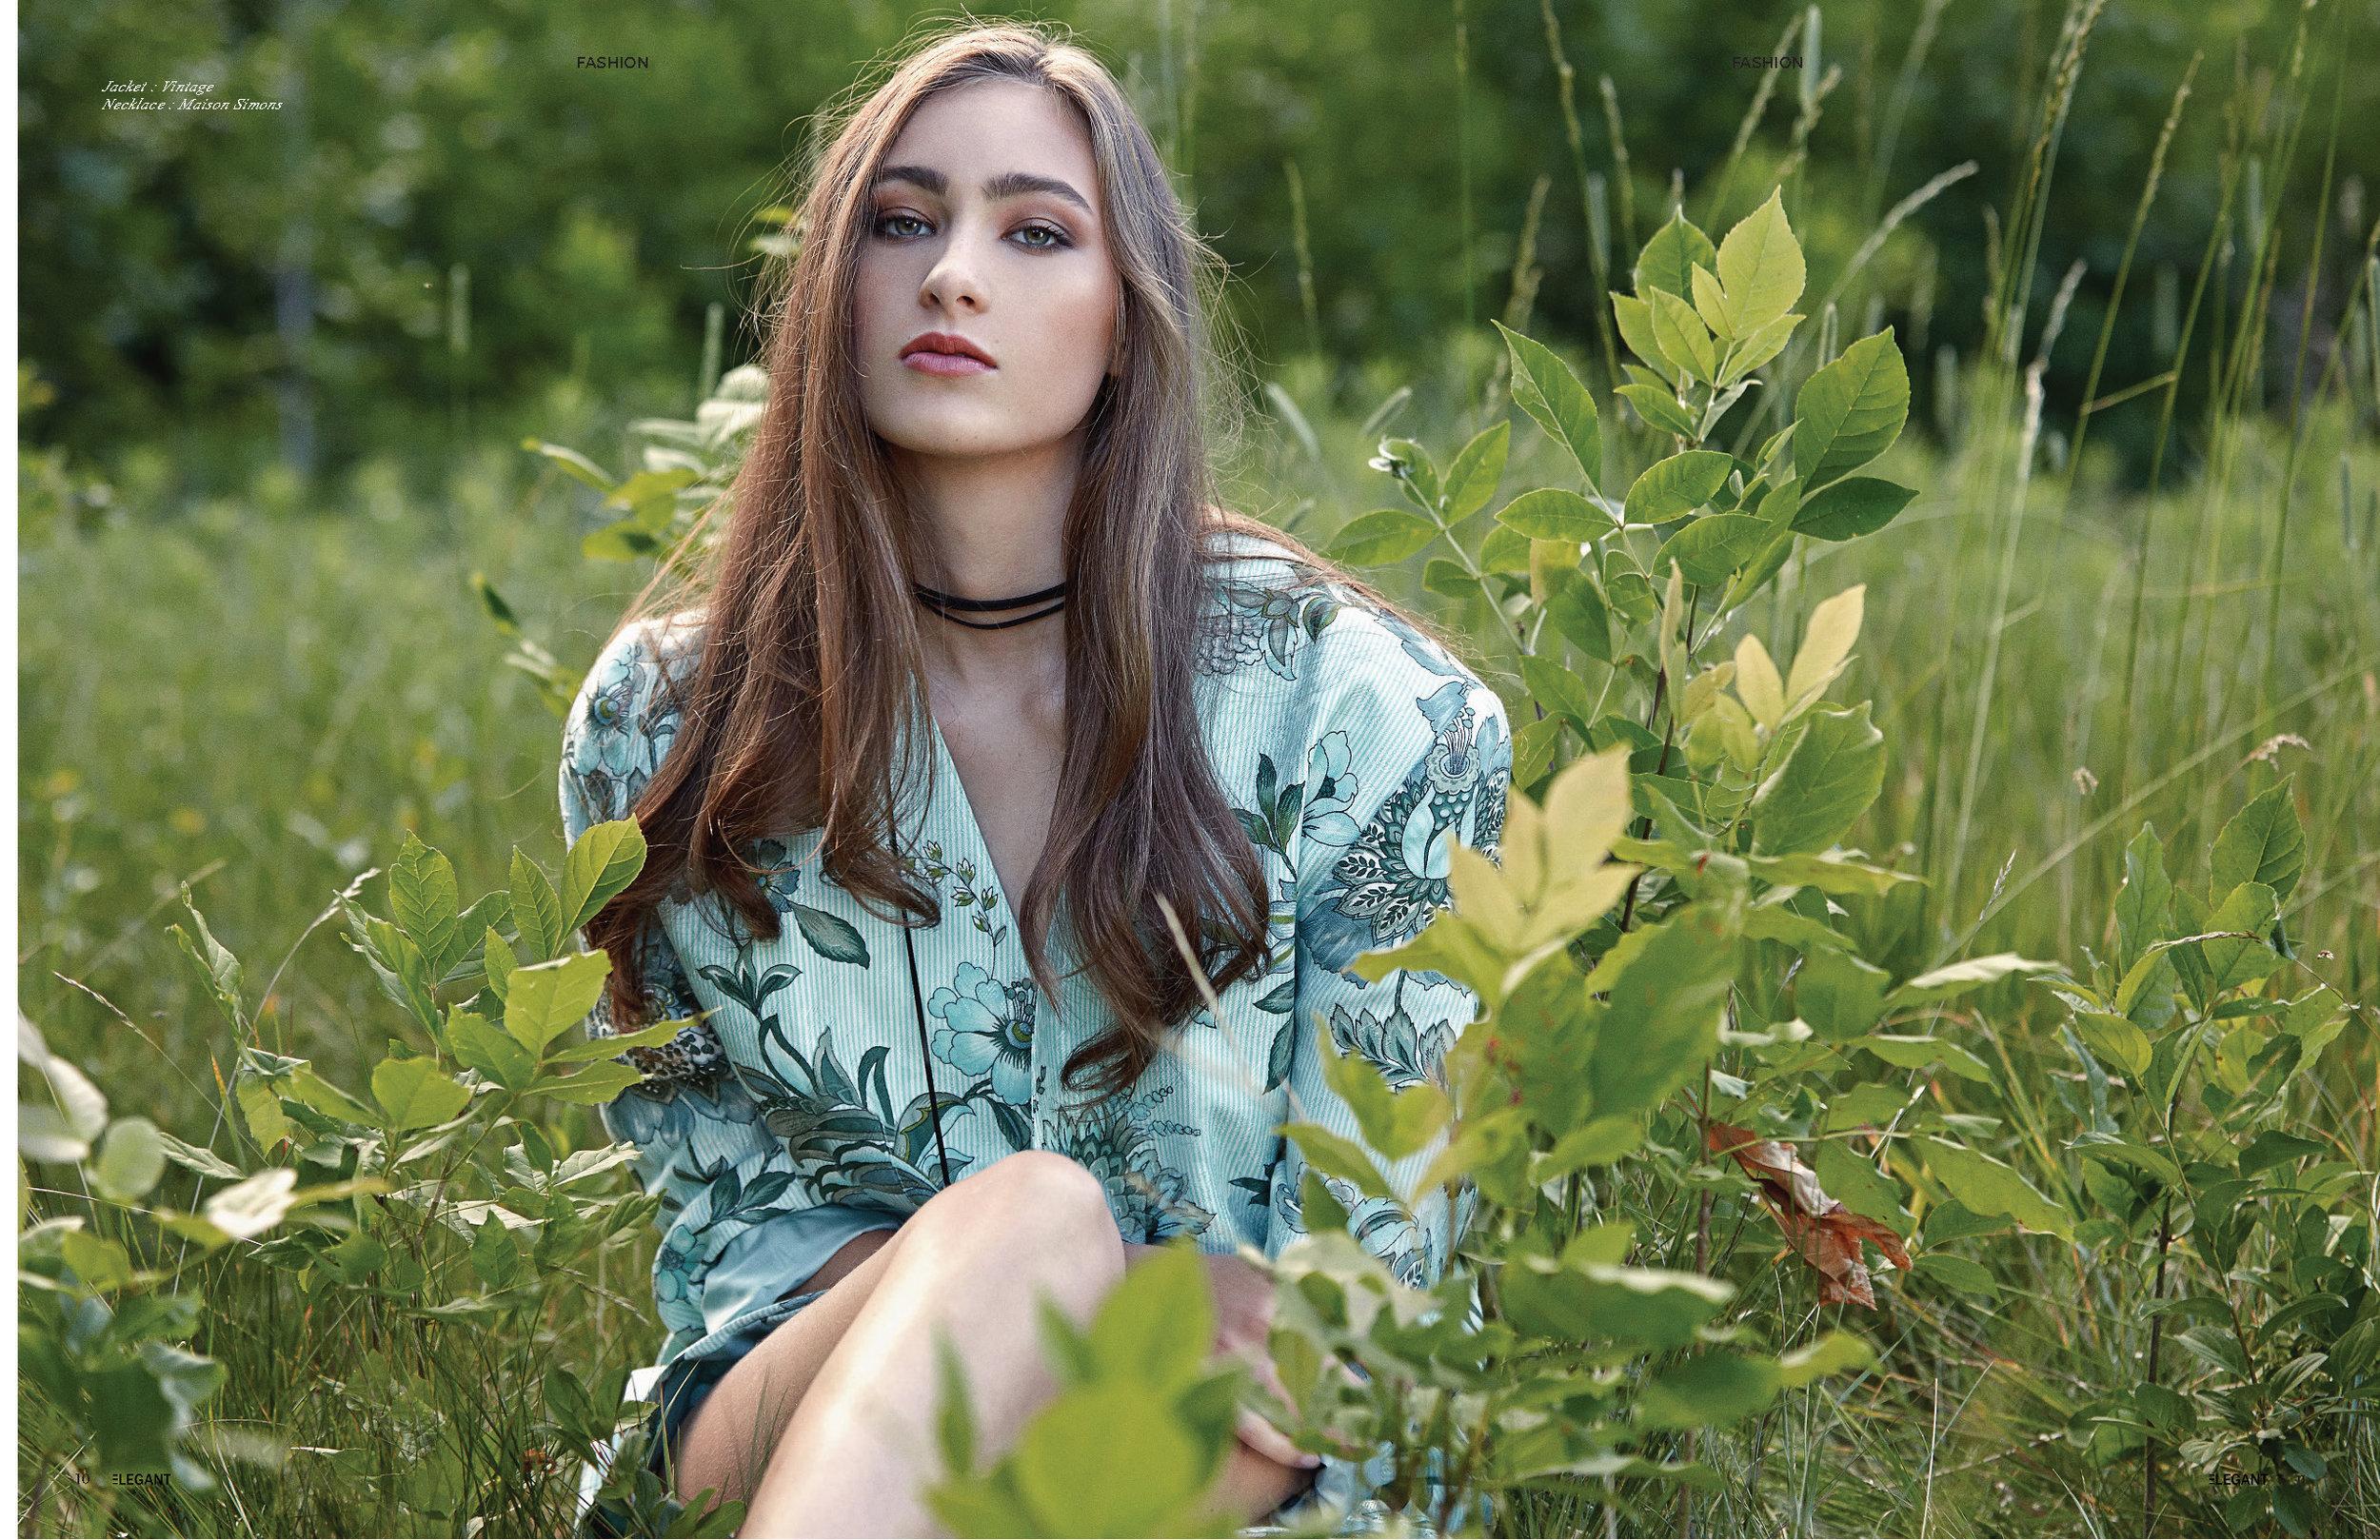 Emilie_Tournevache_Boheme_Fashion_Editorial_Photographer